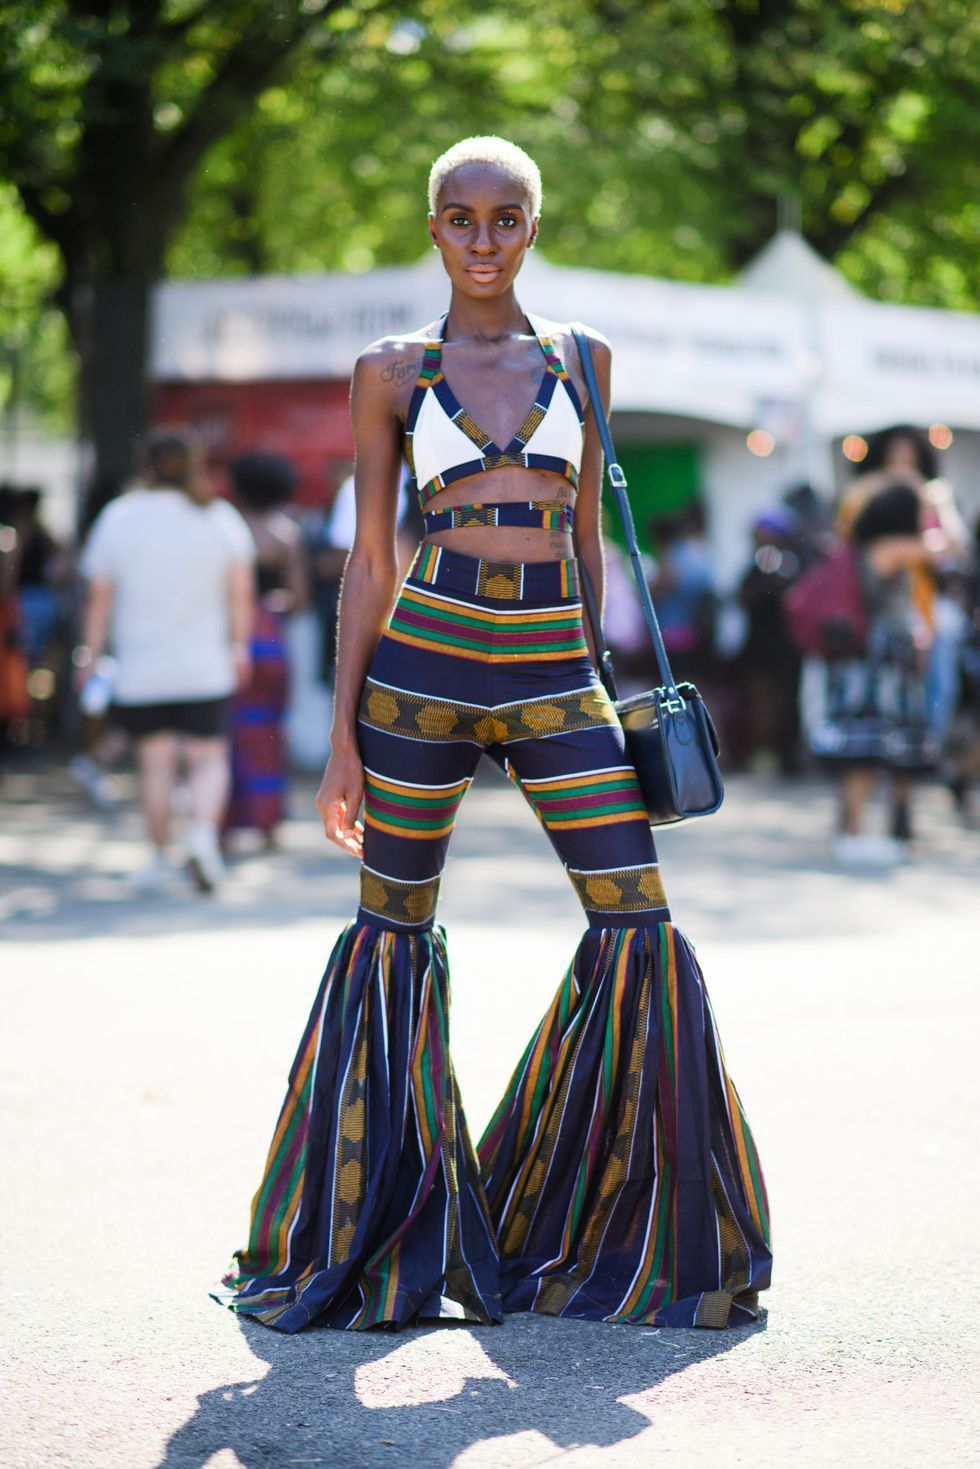 17 times Africans showed how it's done at African Festivals #afrikanischemode 17 times Africans showed how it's done at African Festivals - Eleksie Noir #afrikanischerstil